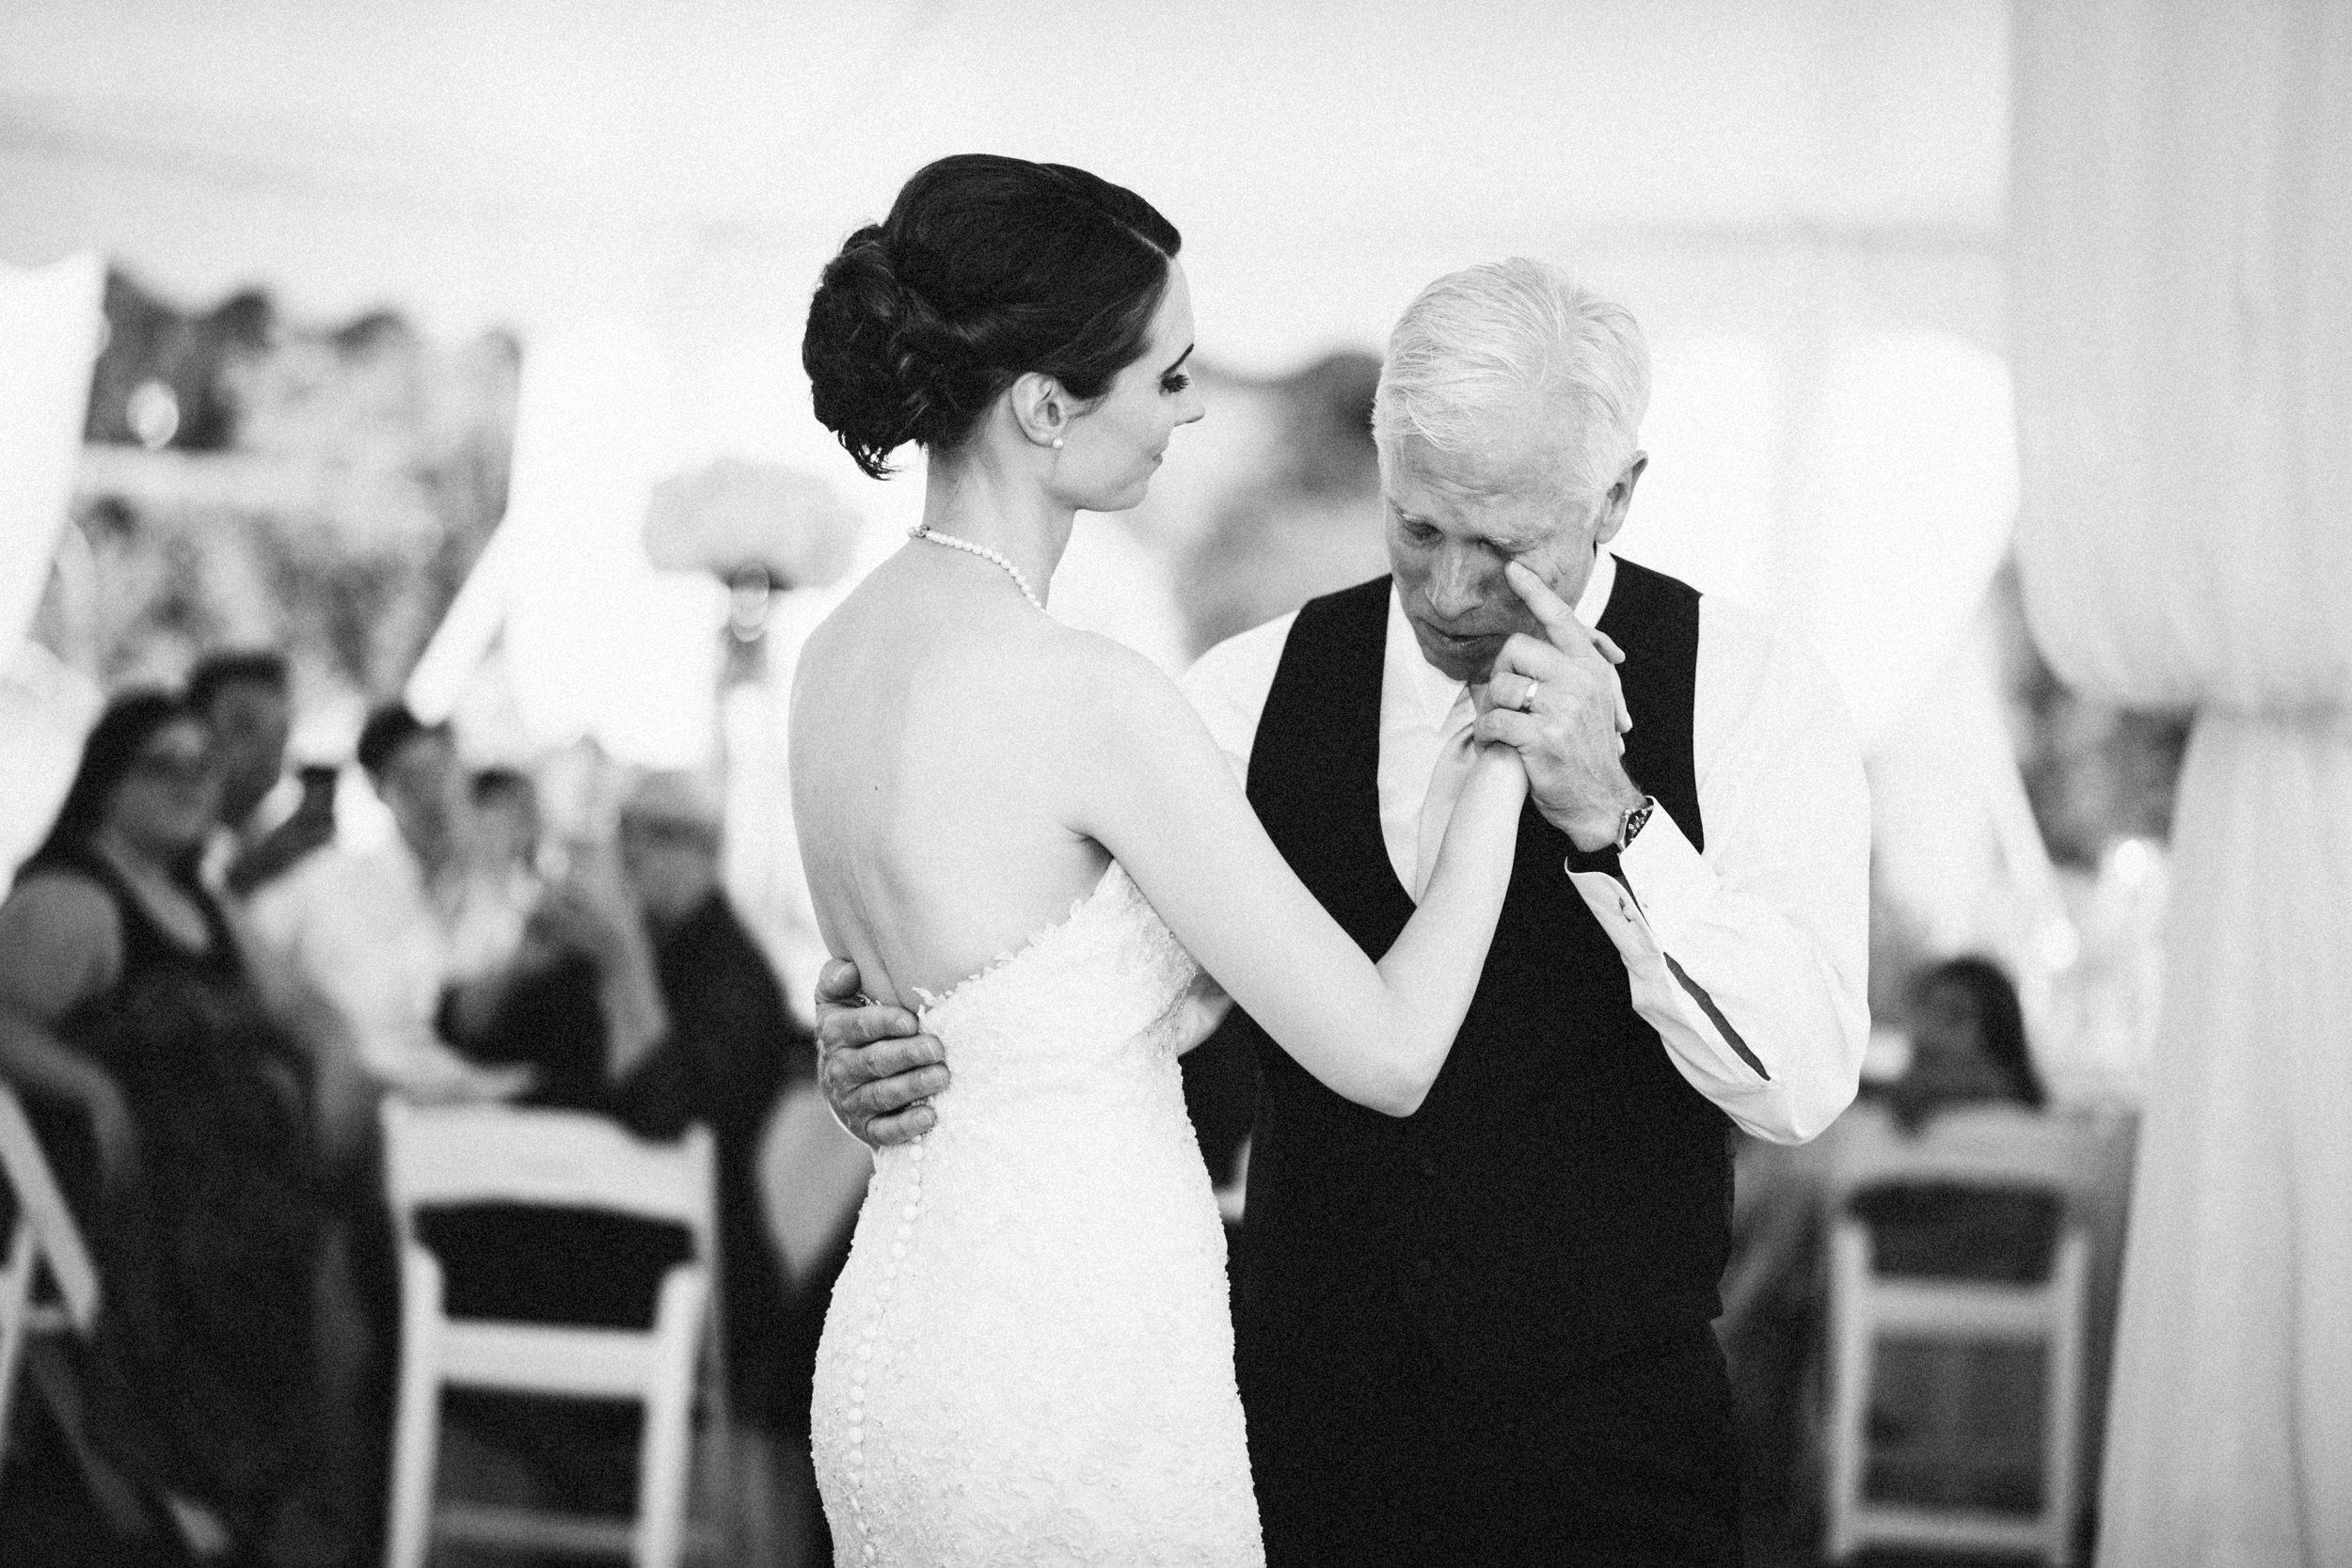 Louisville-Kentucky-Wedding-Elopement-Photographer-Sarah-Katherine-Davis-Photography-Whitehall-Classic-Timeless-Garden-Wedding-686.jpg